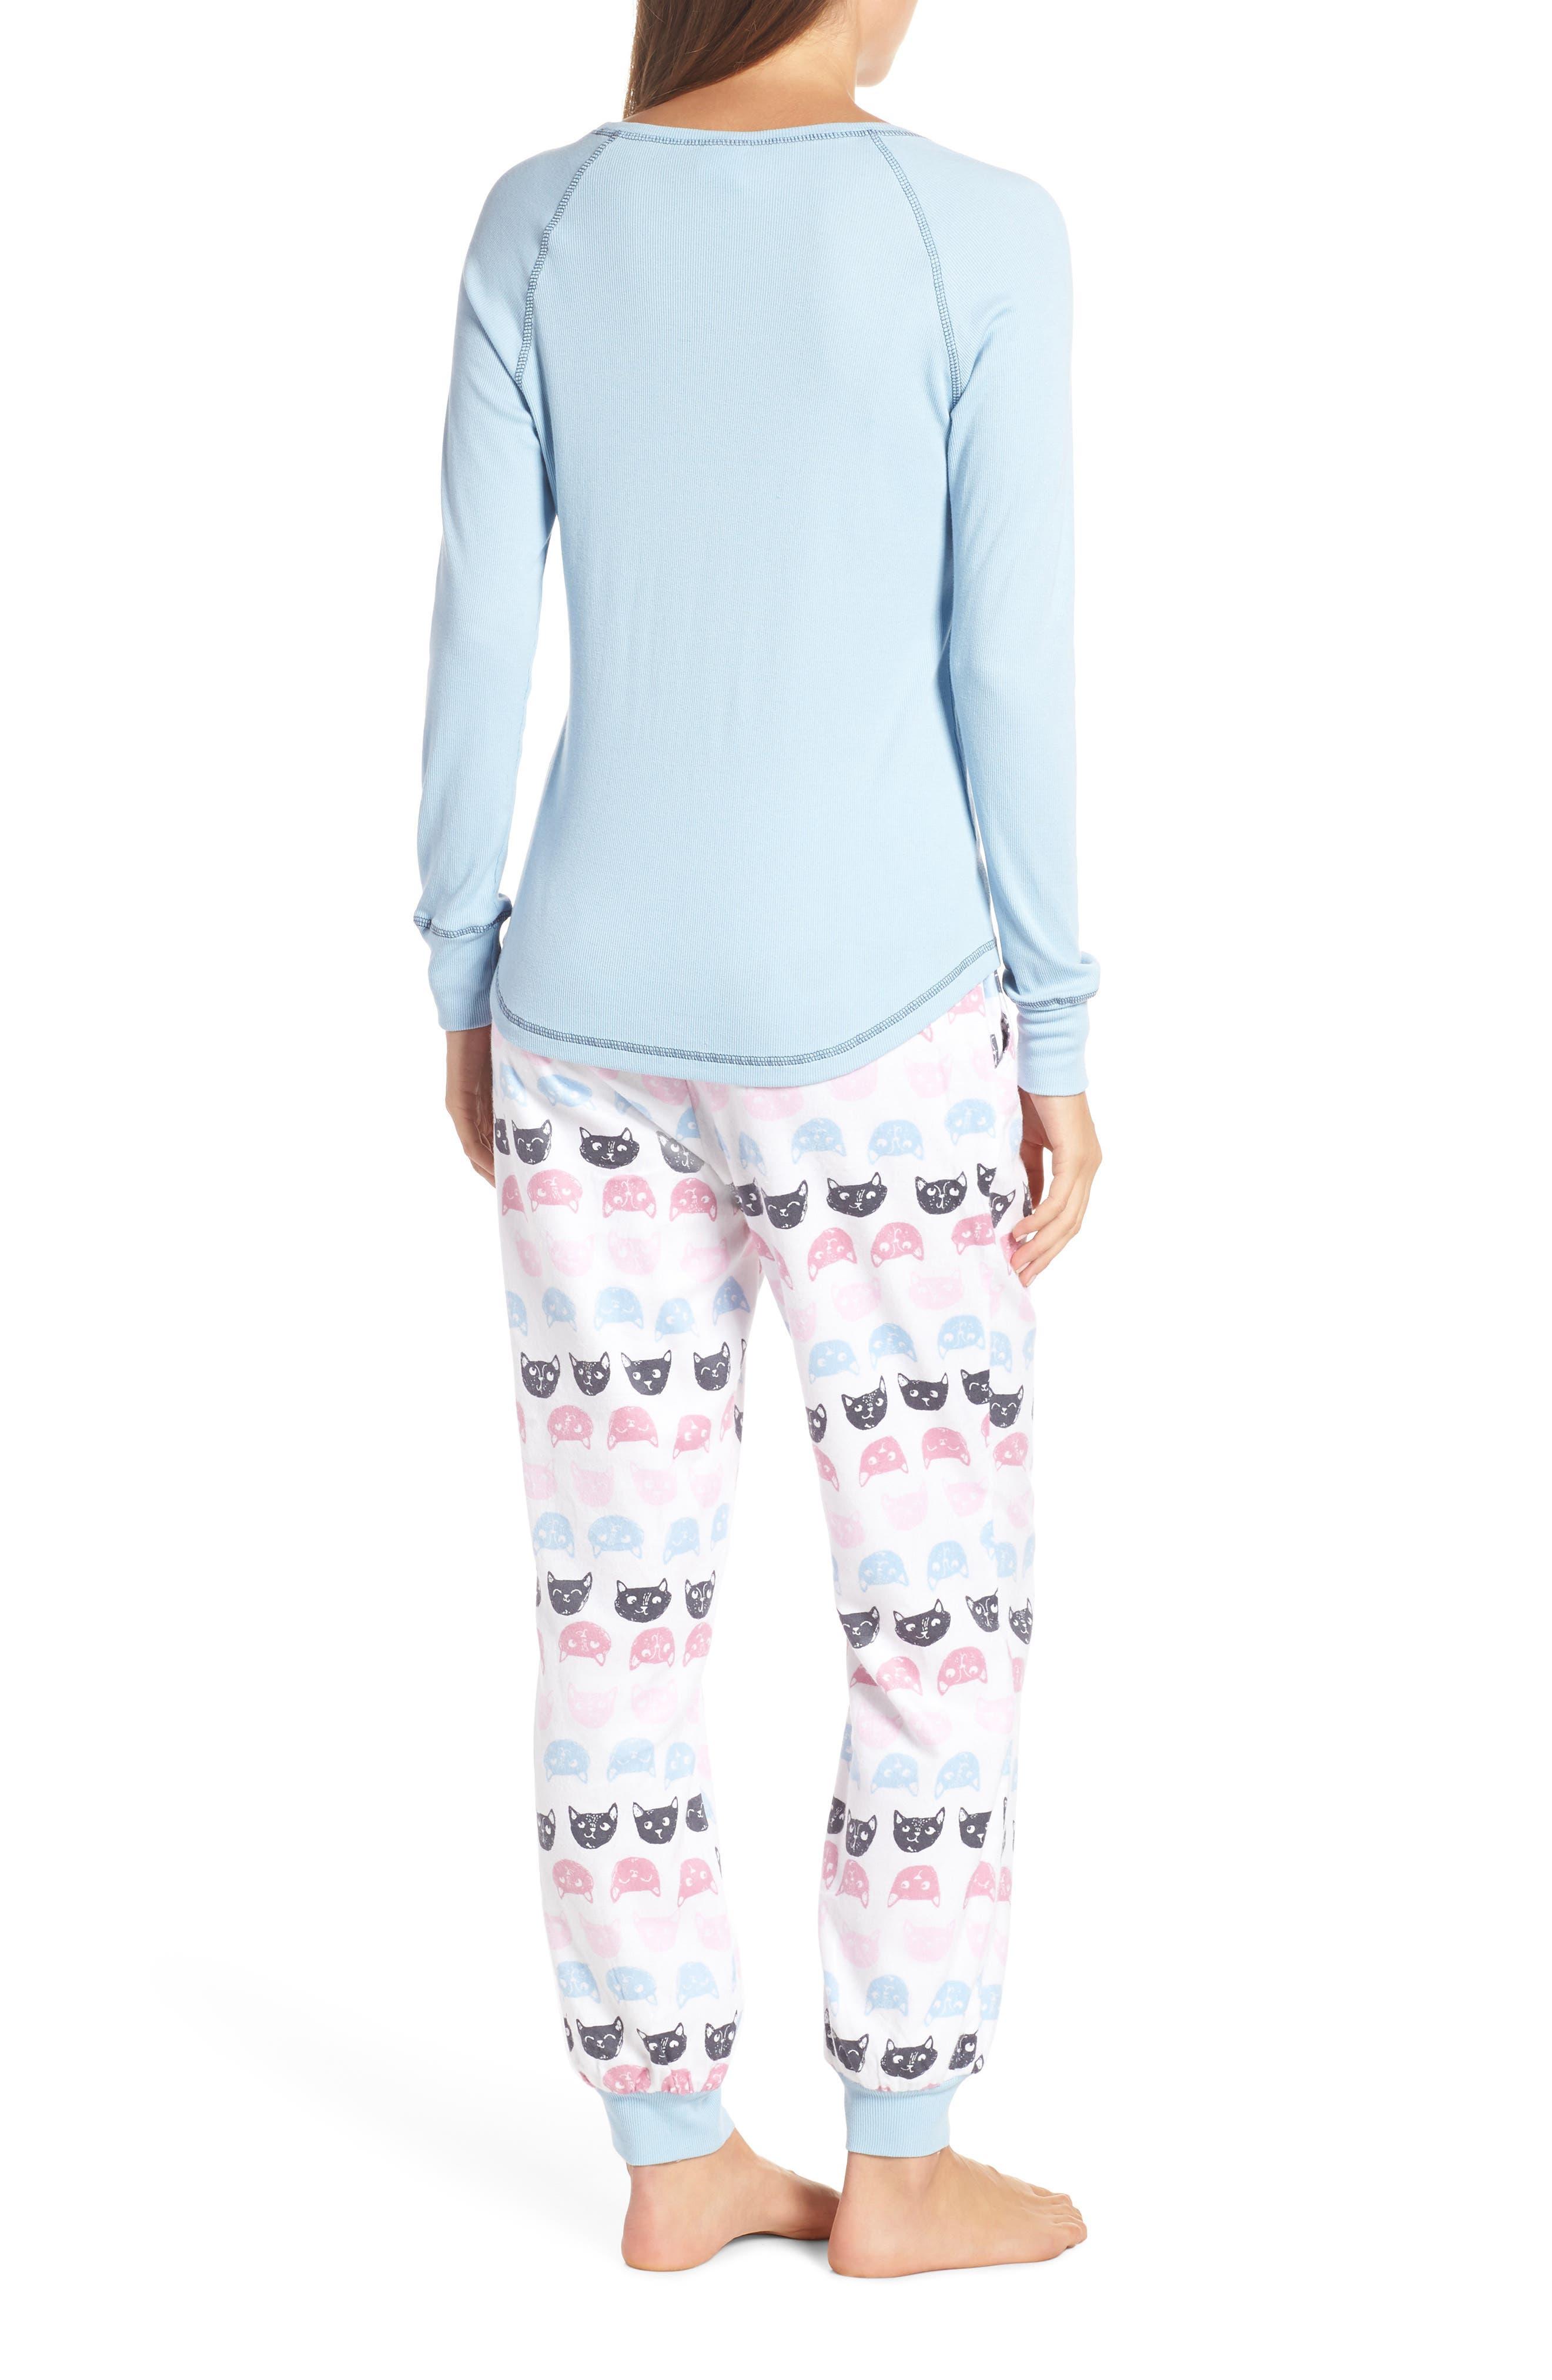 MUNKI MUNKI,                             Knit & Flannel Pajamas,                             Alternate thumbnail 2, color,                             WHITE CATS